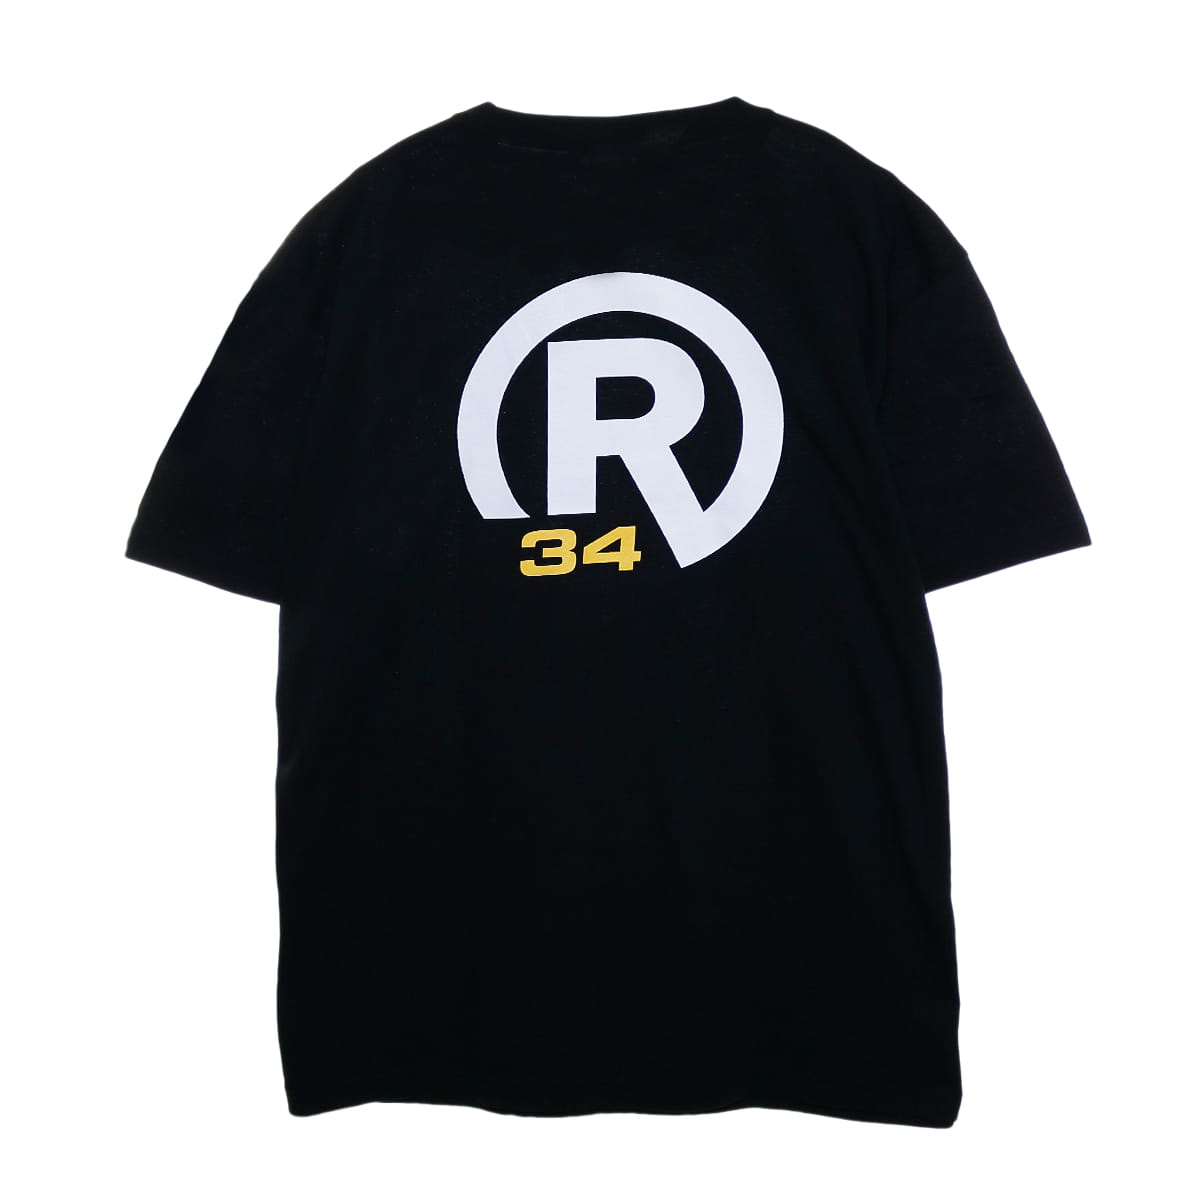 BASIC R34 LOGO T-SHIRT BIG SIZE